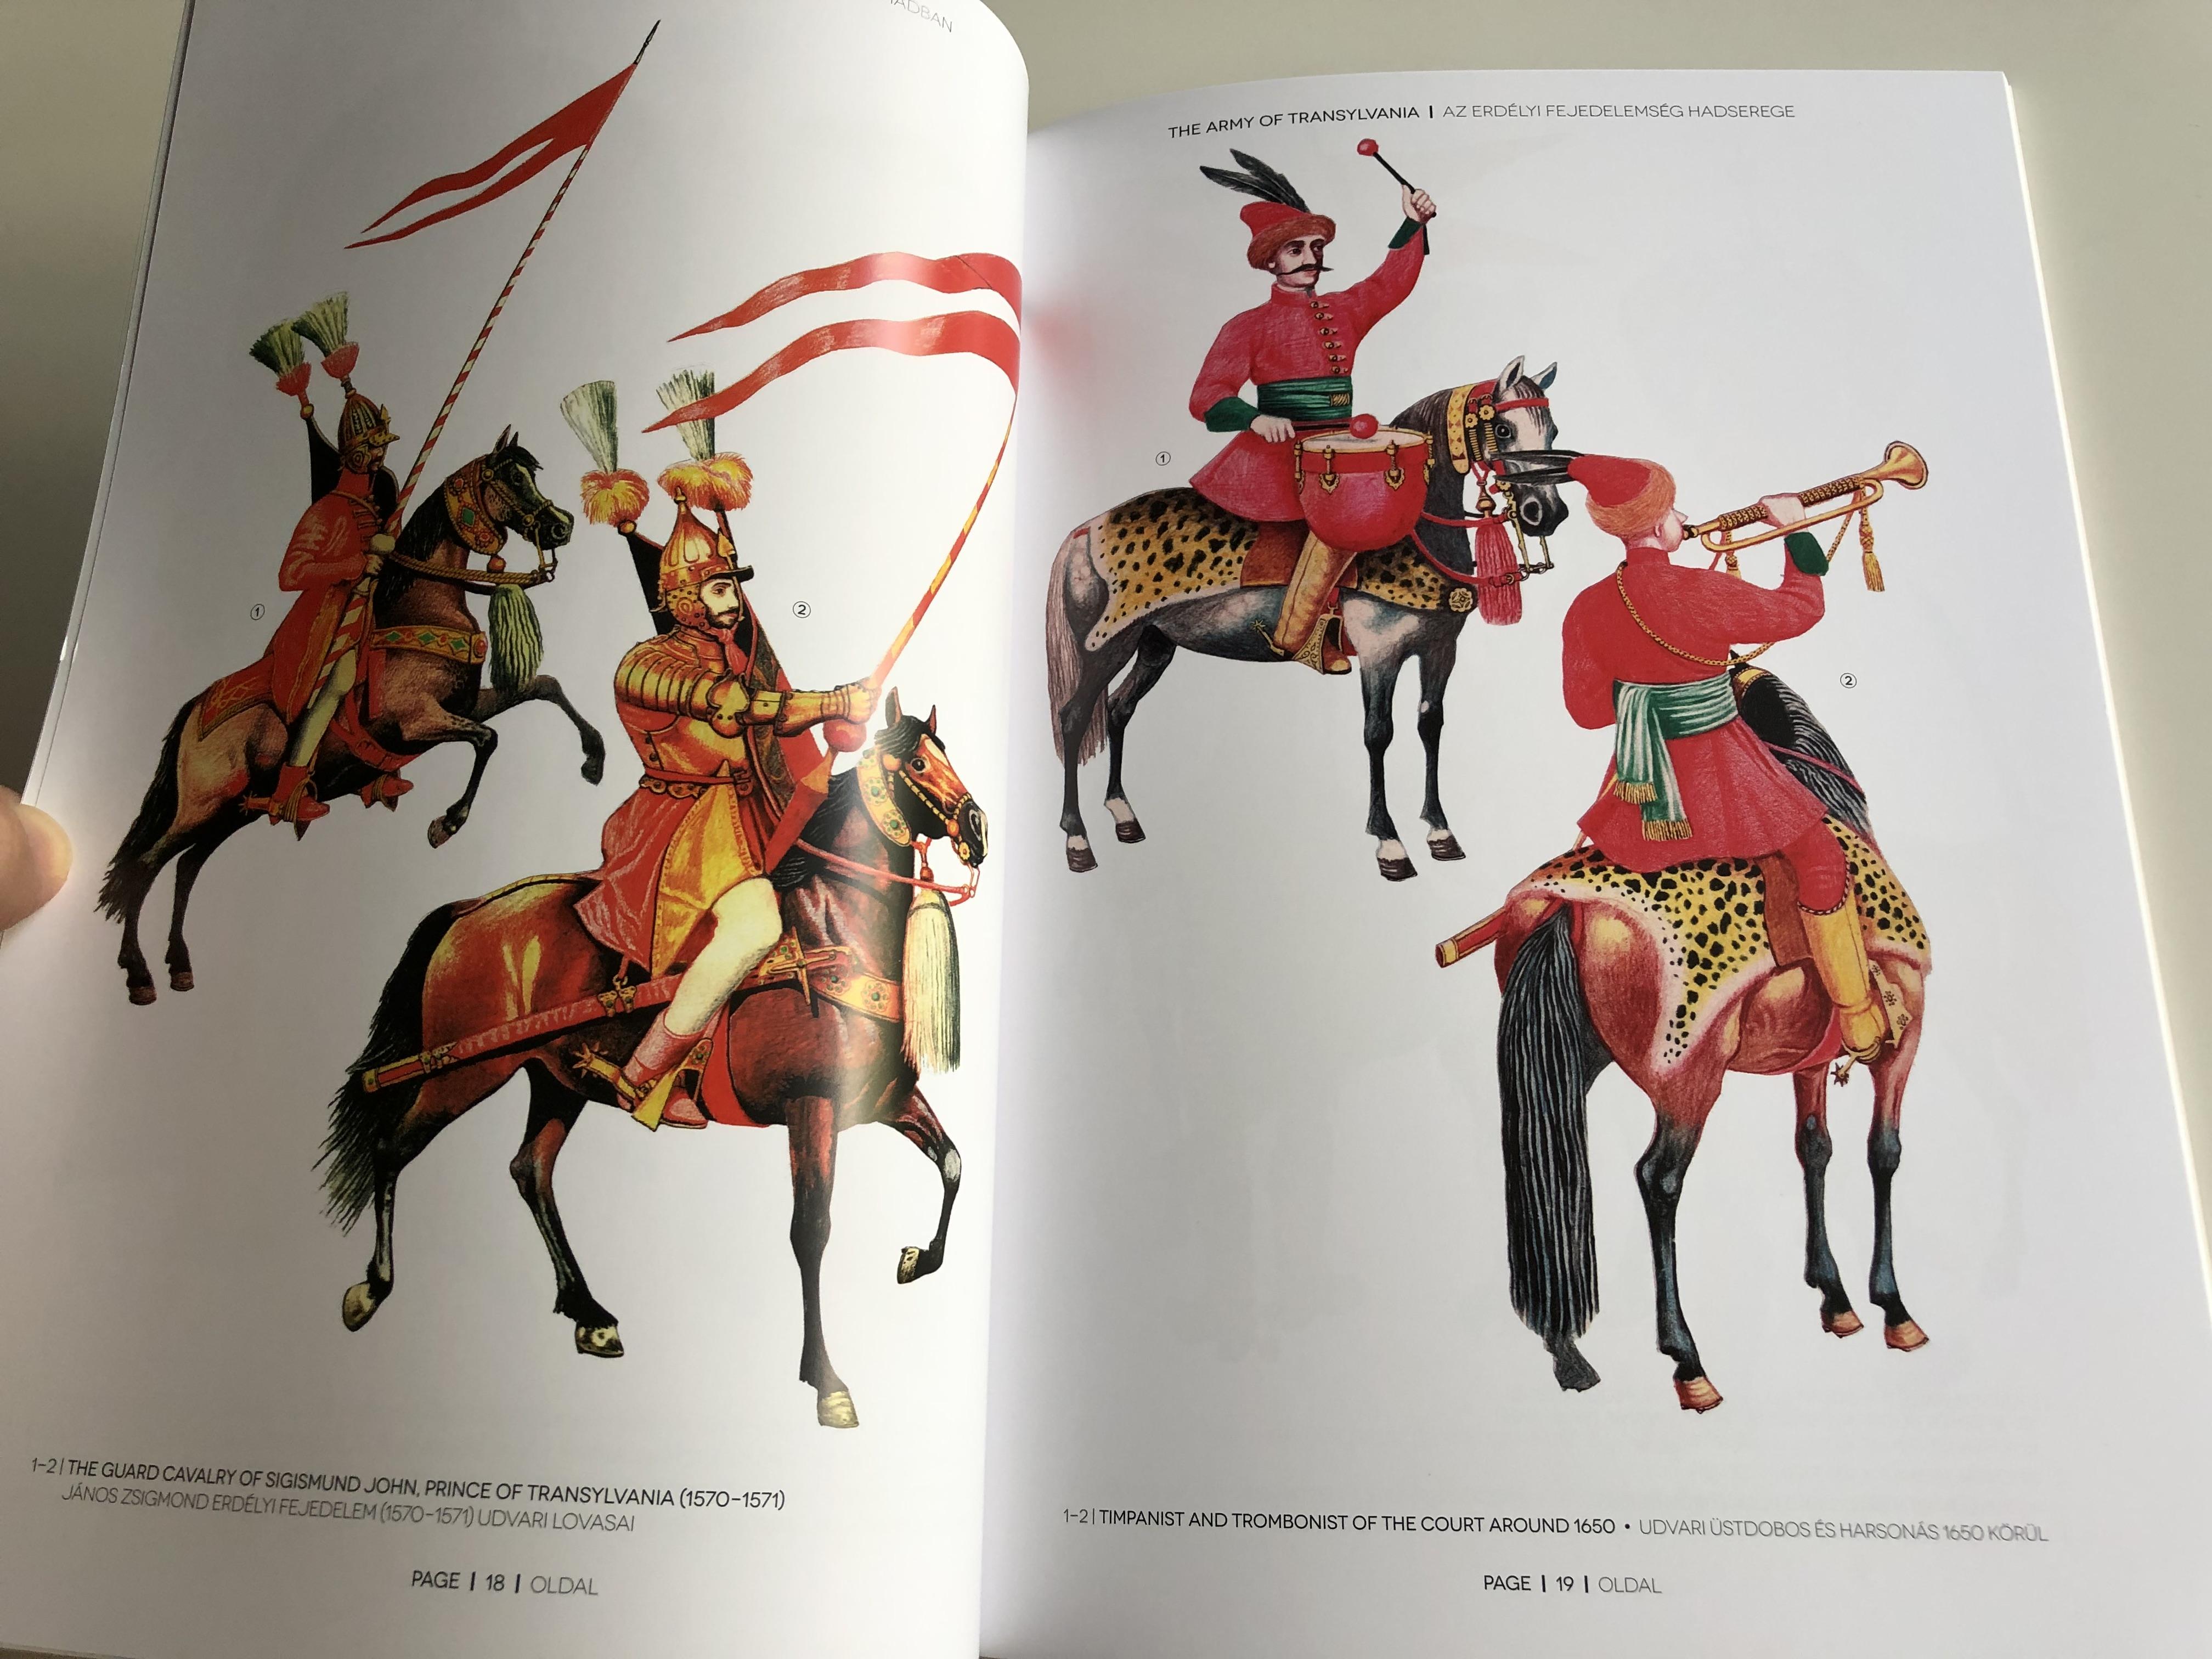 the-army-of-transylvania-1559-1690-by-gy-z-somogyi-az-erd-lyi-fejedelms-g-hadserege-1559-1690-h-bor-k-magyar-a-millenium-in-the-military-egy-ezred-v-hadban-paperback-2016-hm-zr-nyi-5-.jpg